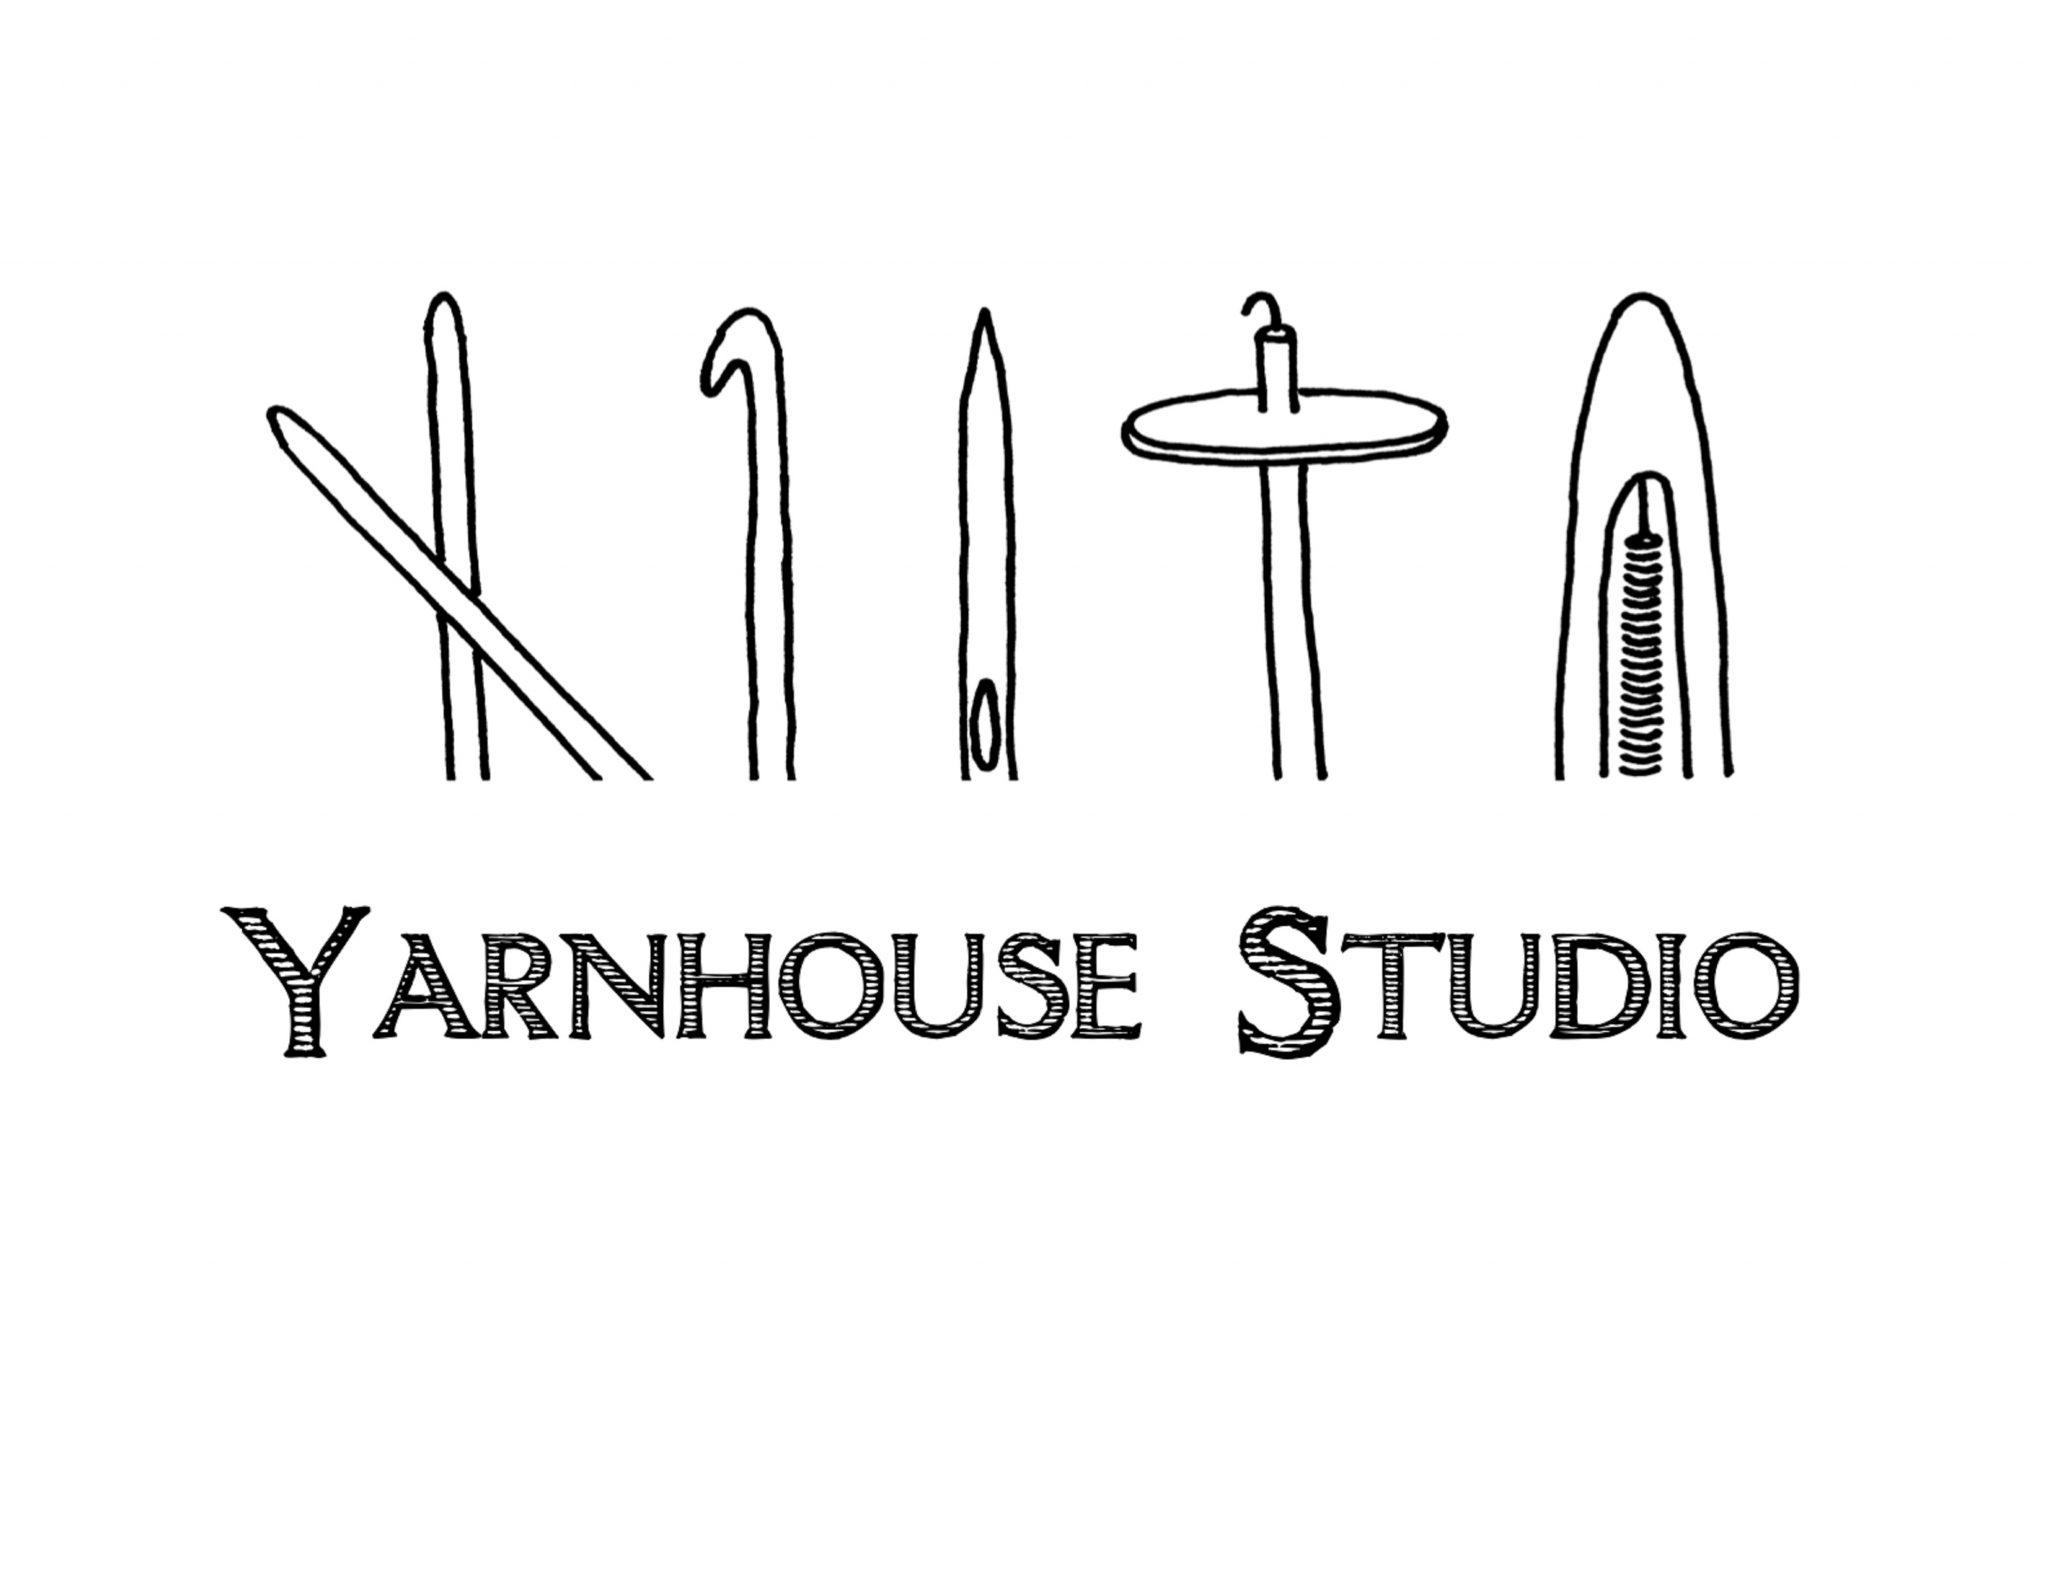 Yarnhouse Studio